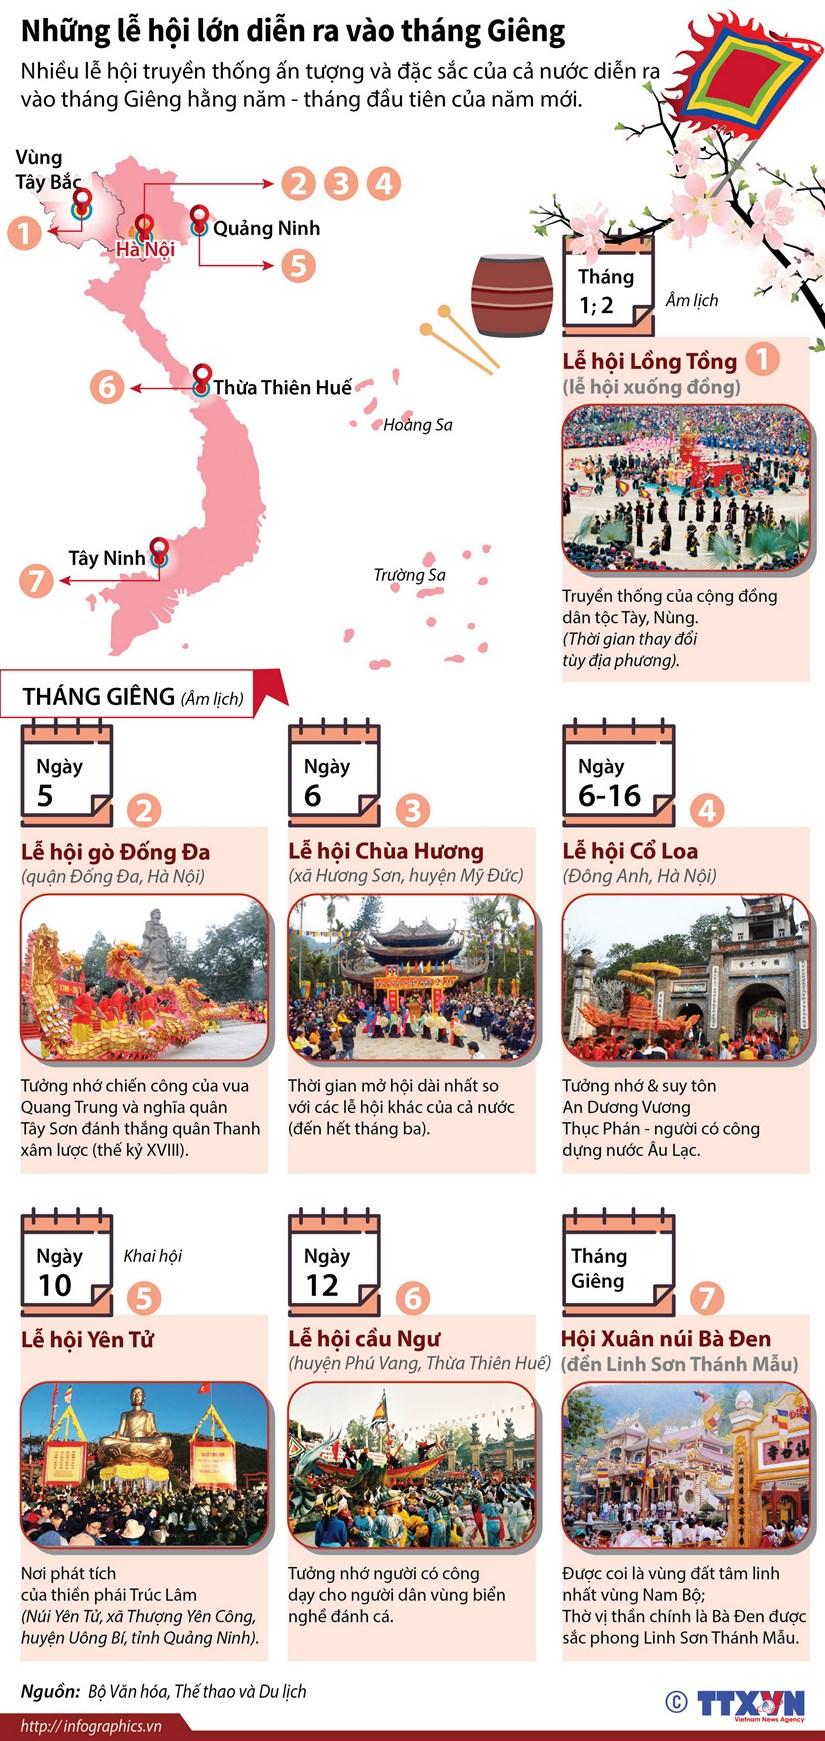 [Infographics] Nhung le hoi lon se dien ra trong thang Gieng hinh anh 1